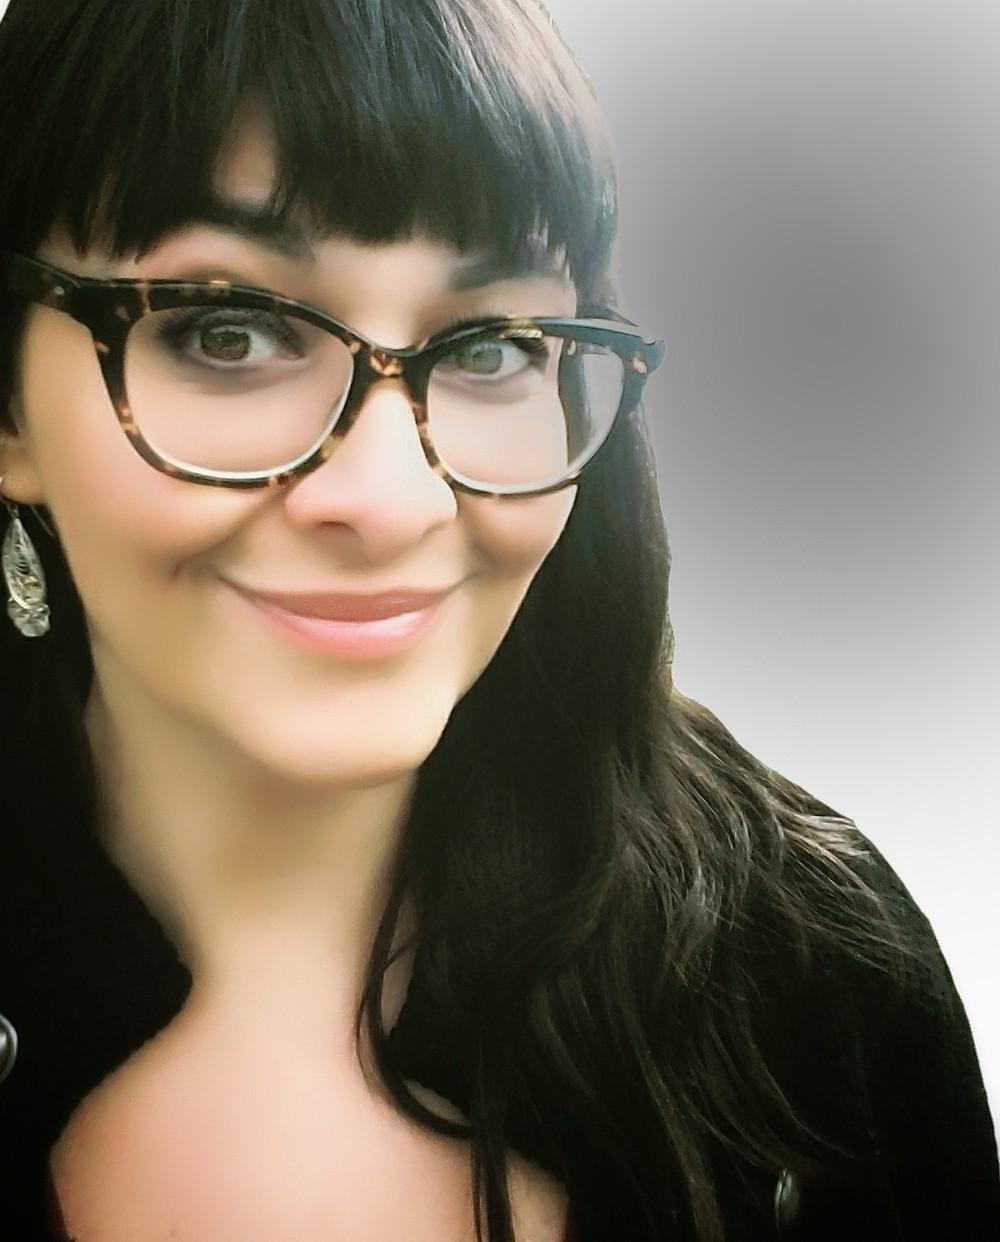 writer Maryana Lucia Vestic